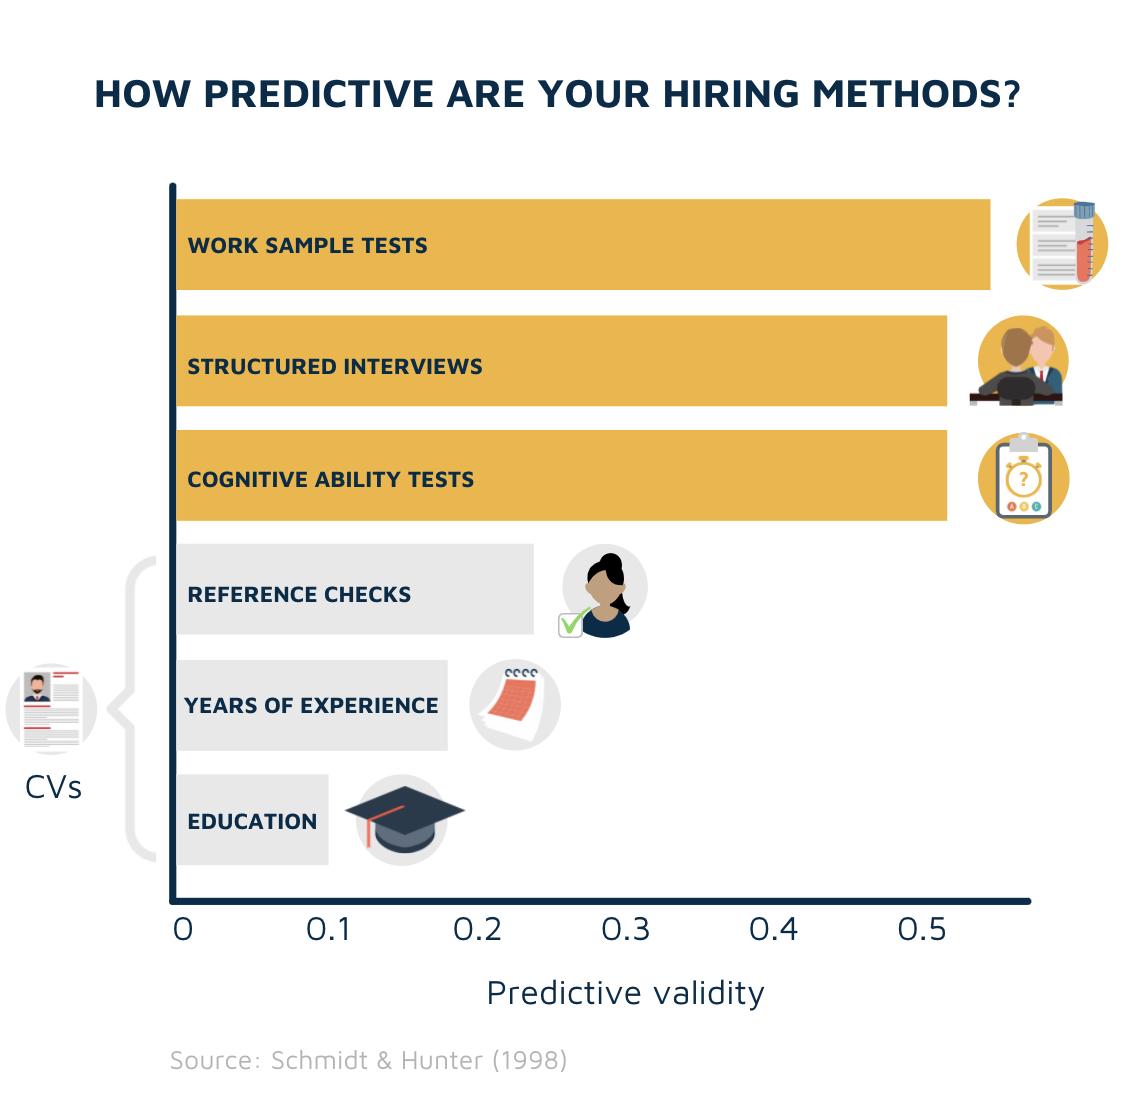 Predictive validity of hiring methods